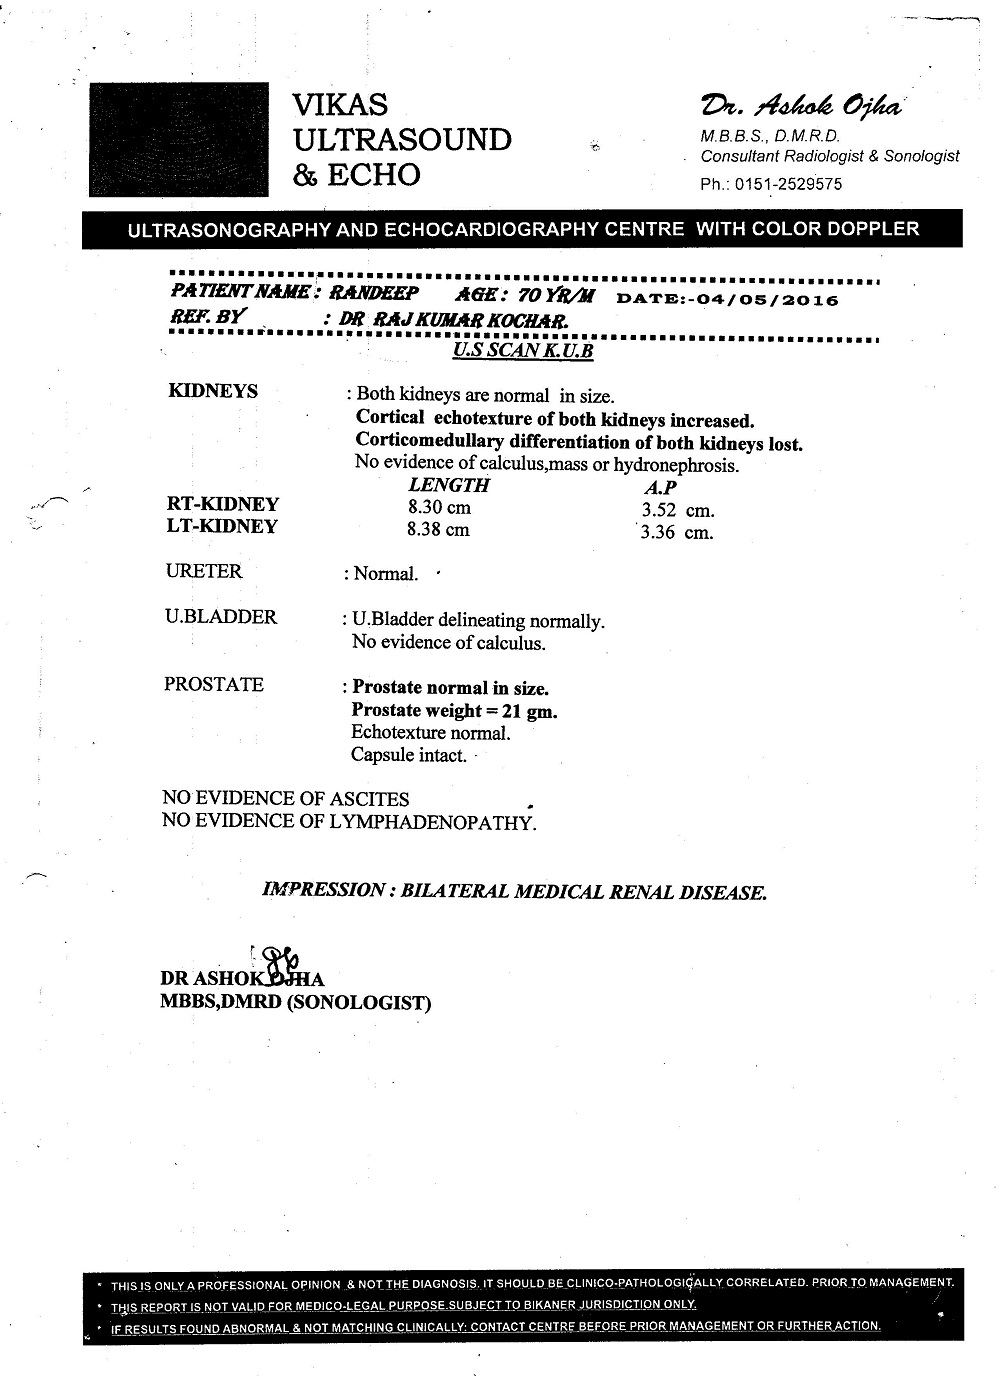 randeep-kumar-kaura-fatty-liver-kindey-failure-patient-treatment-10